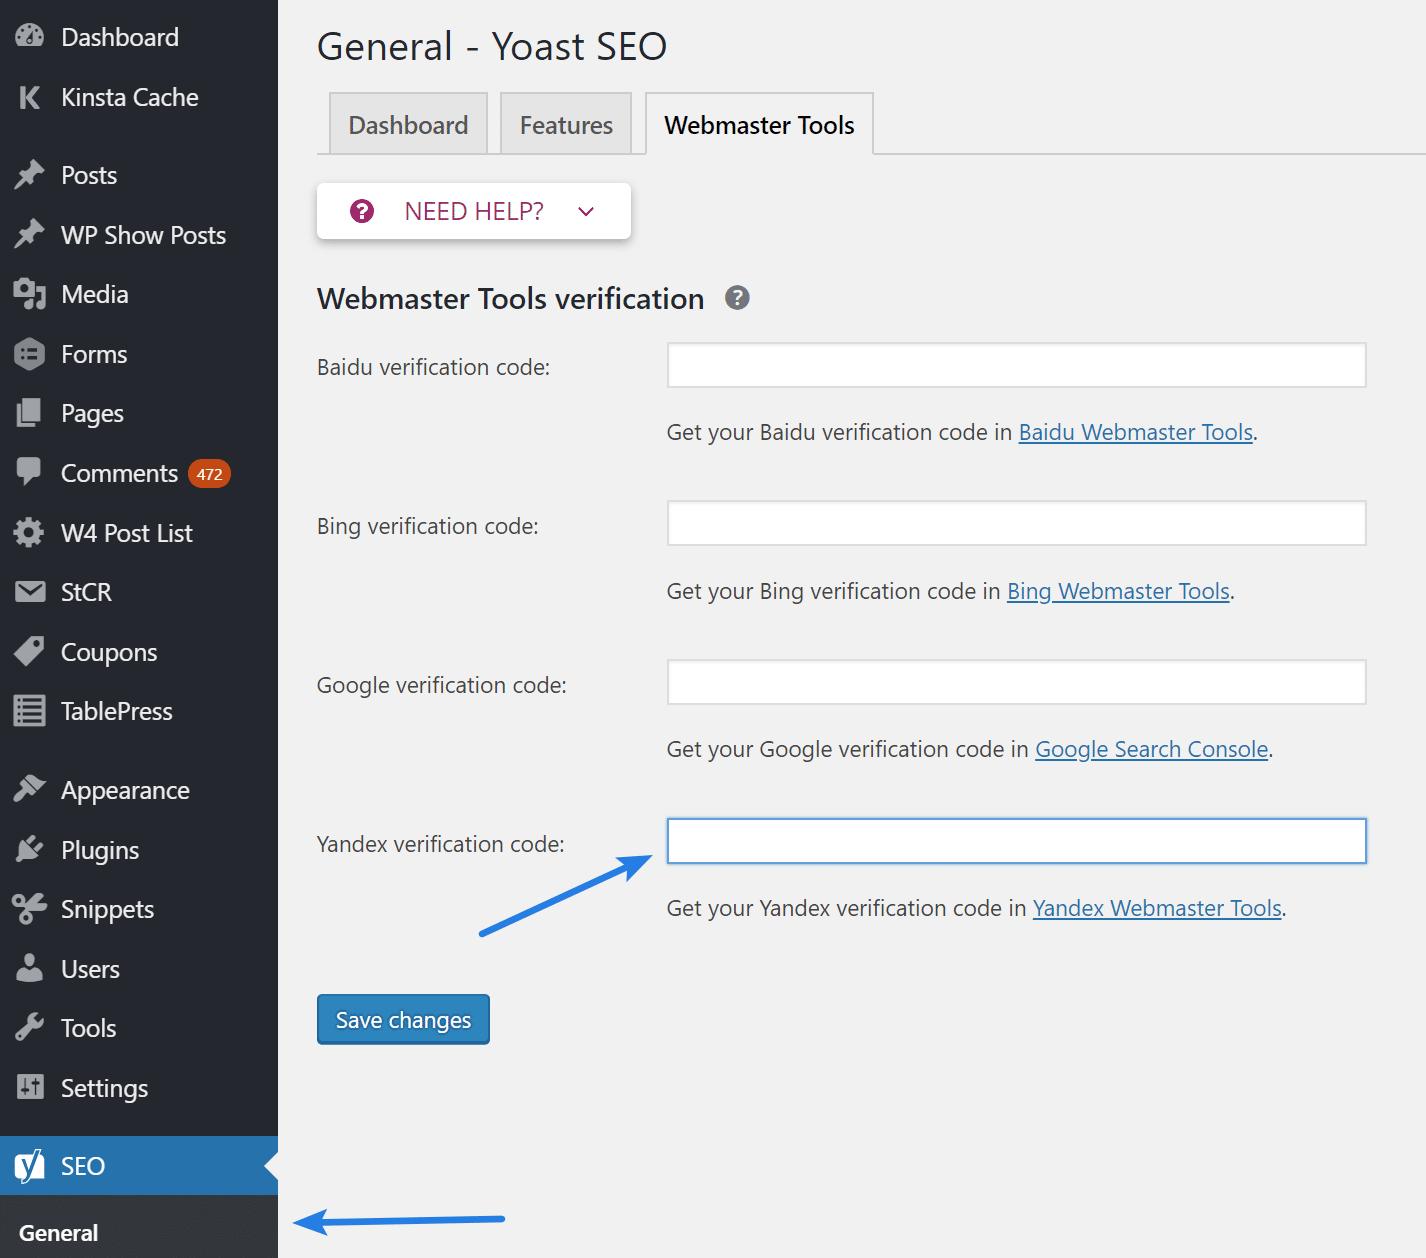 Adding Yandex Meta Tag in WordPress